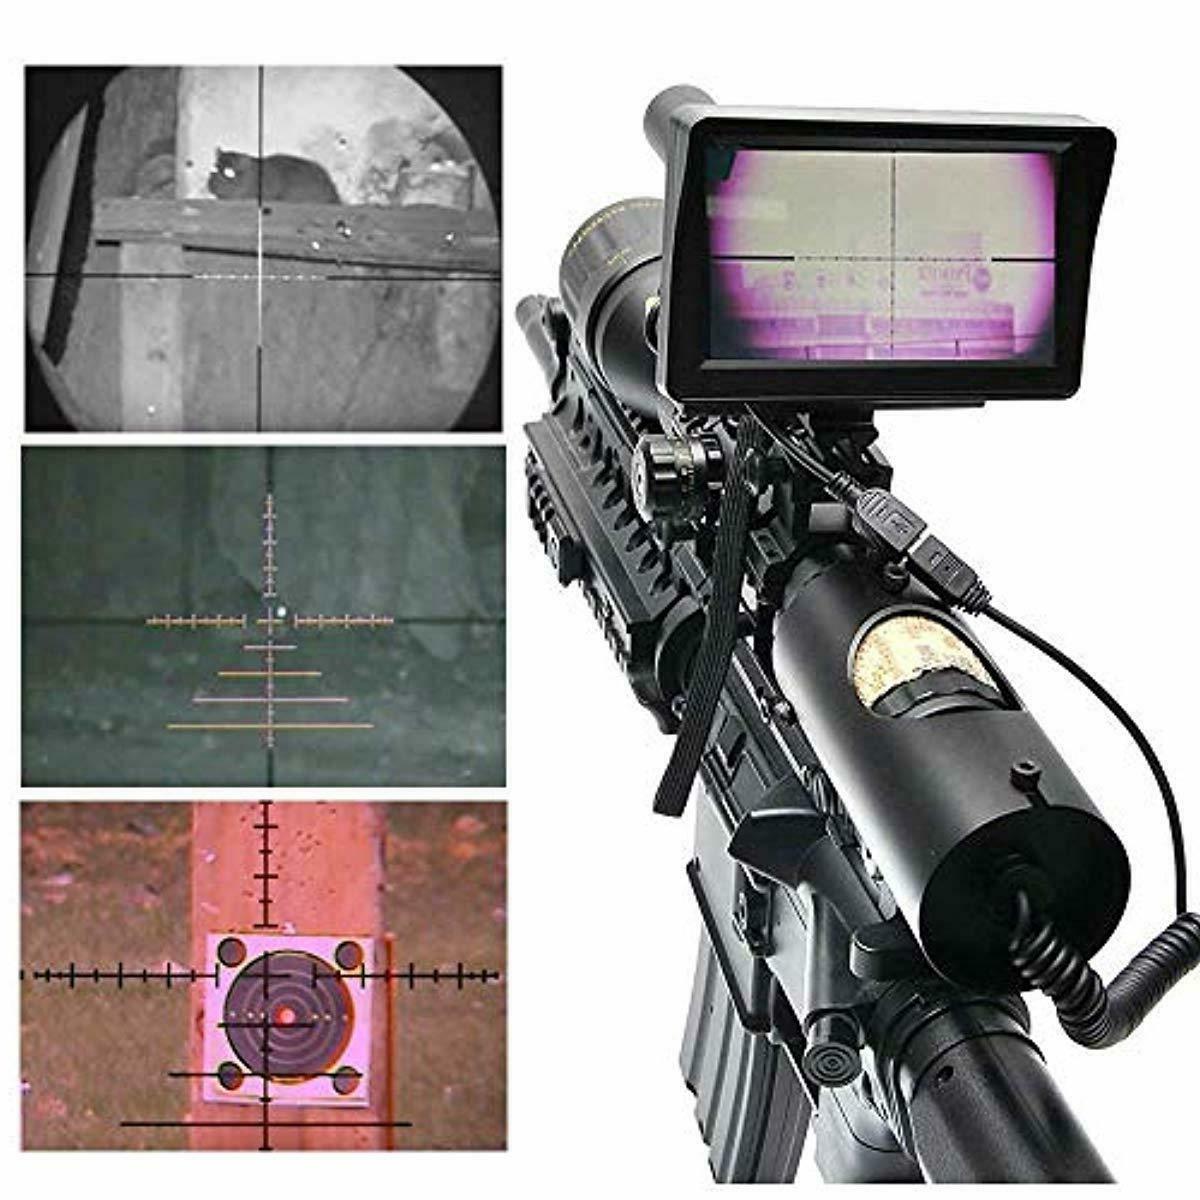 bestsight Night Vision Scope with Camera Port